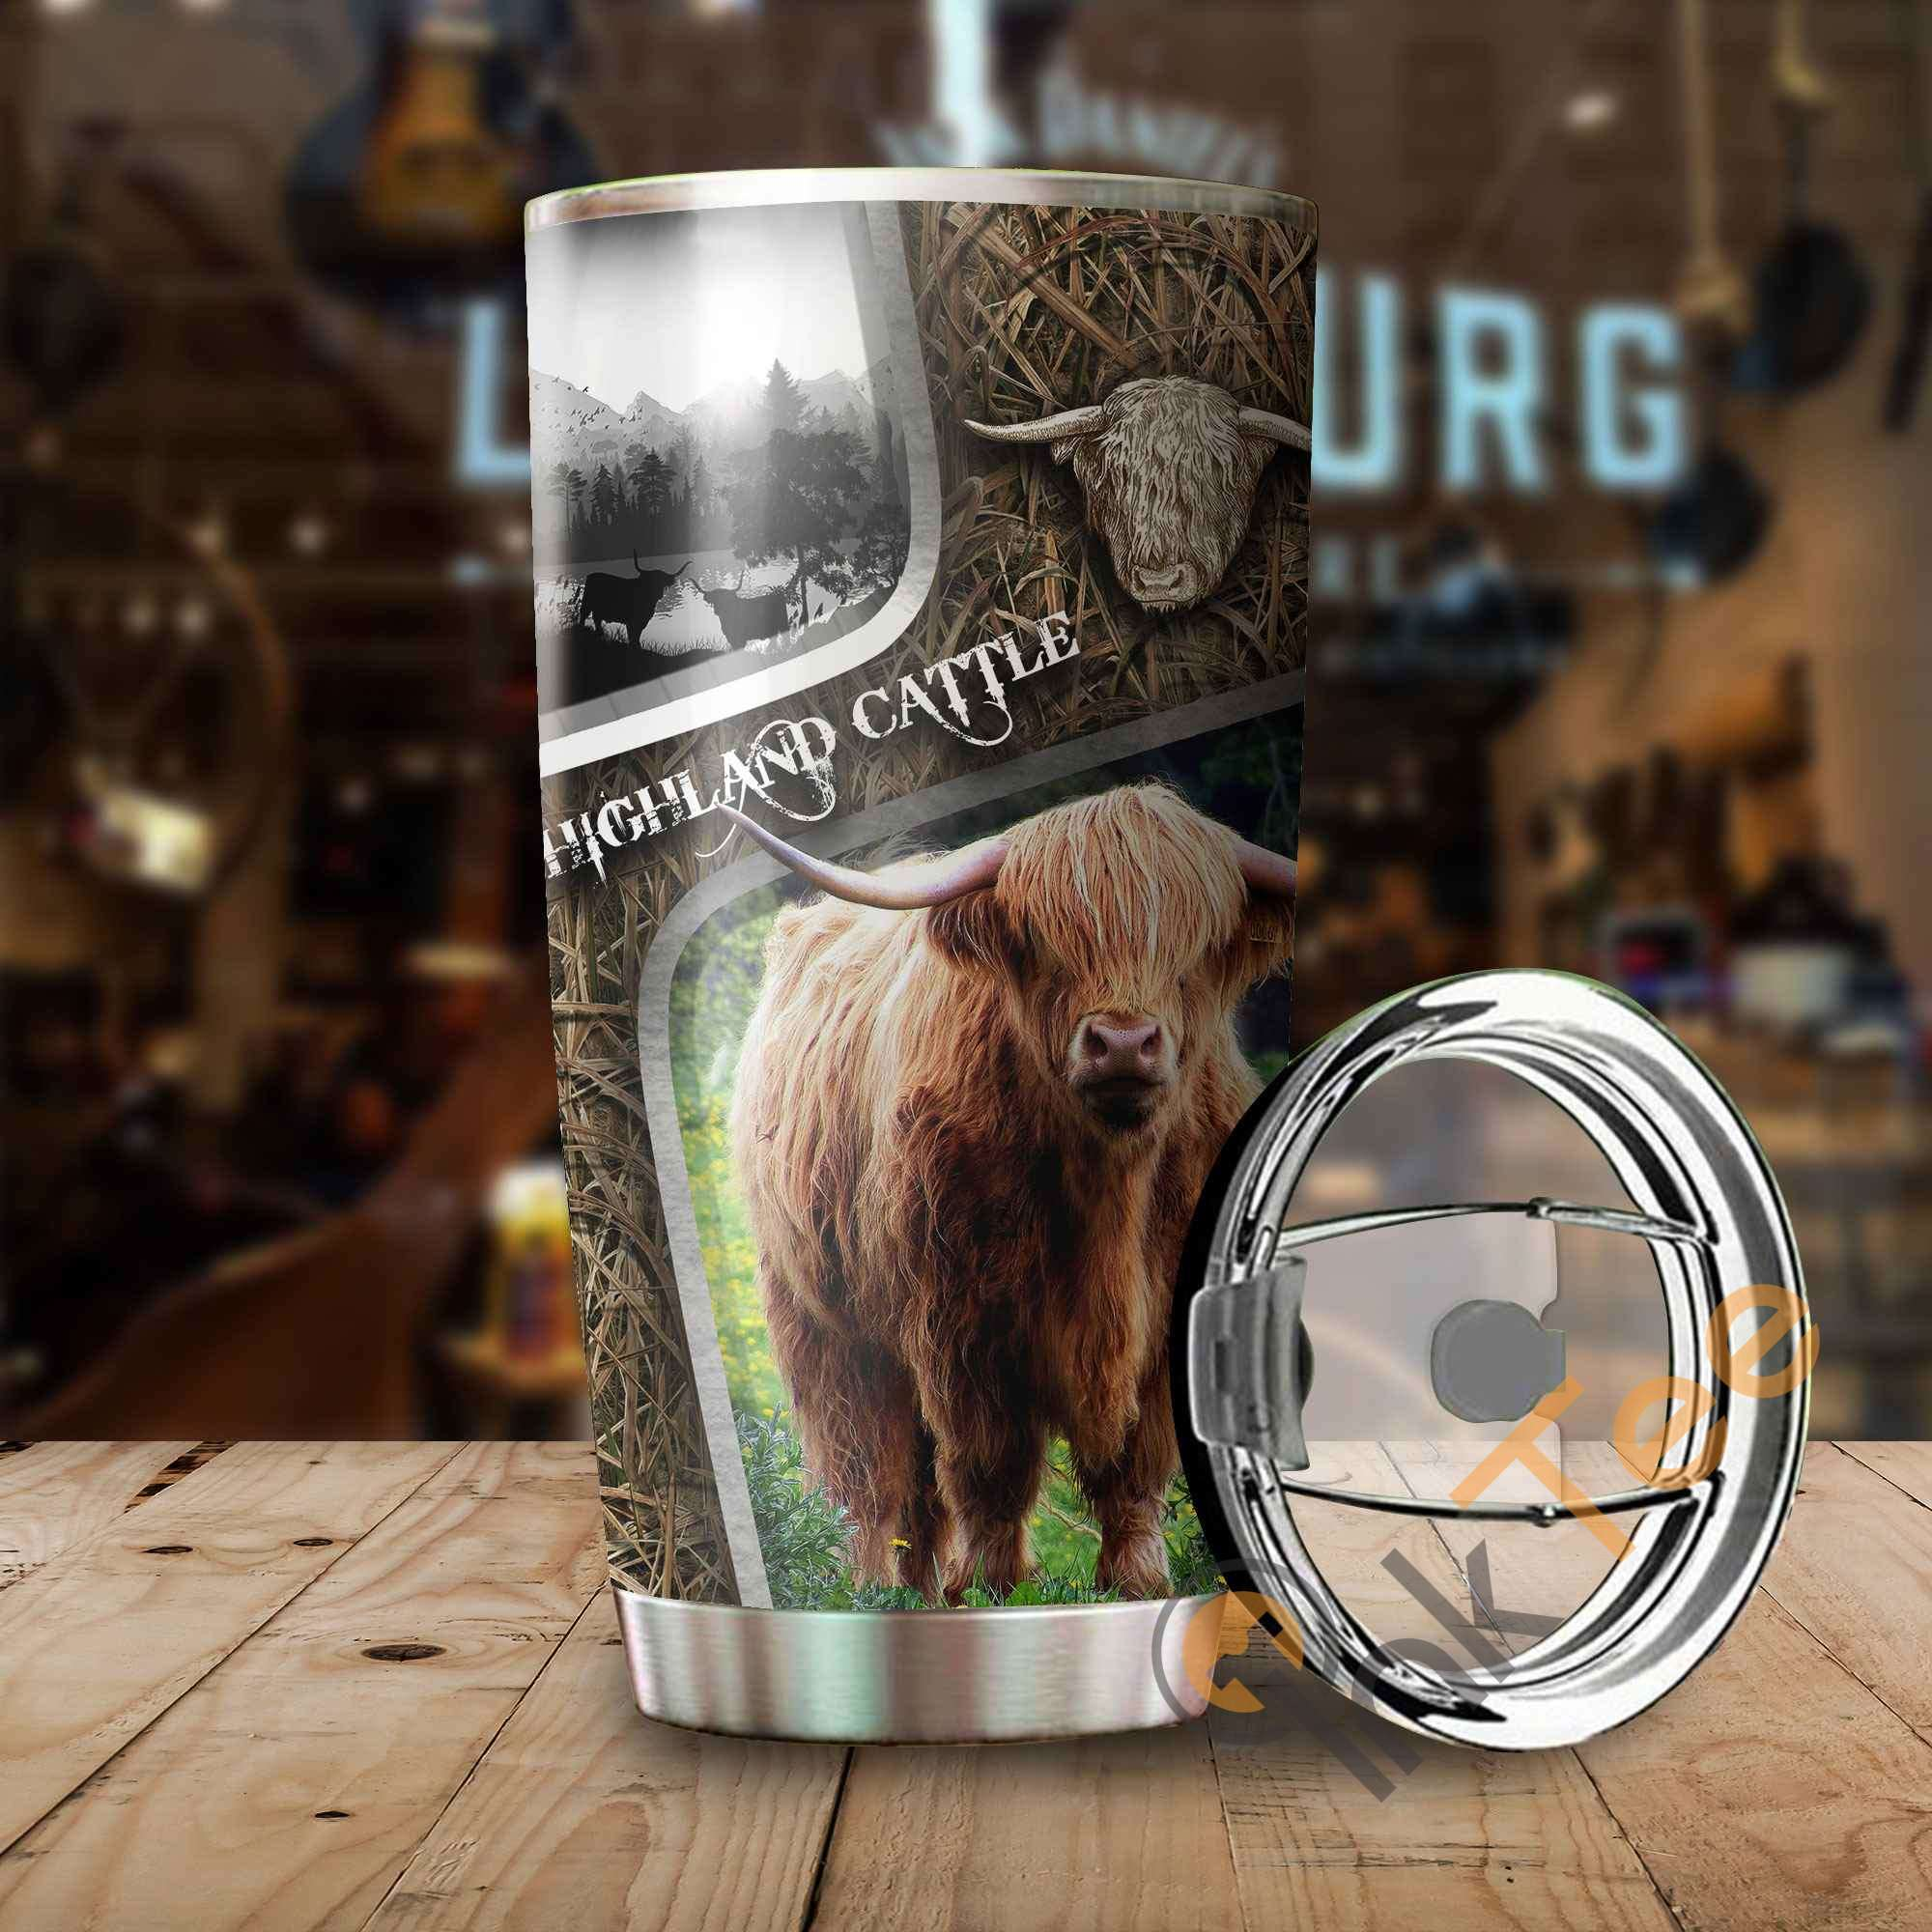 Highland Cattle Camo Amazon Best Seller Sku 3583 Stainless Steel Tumbler